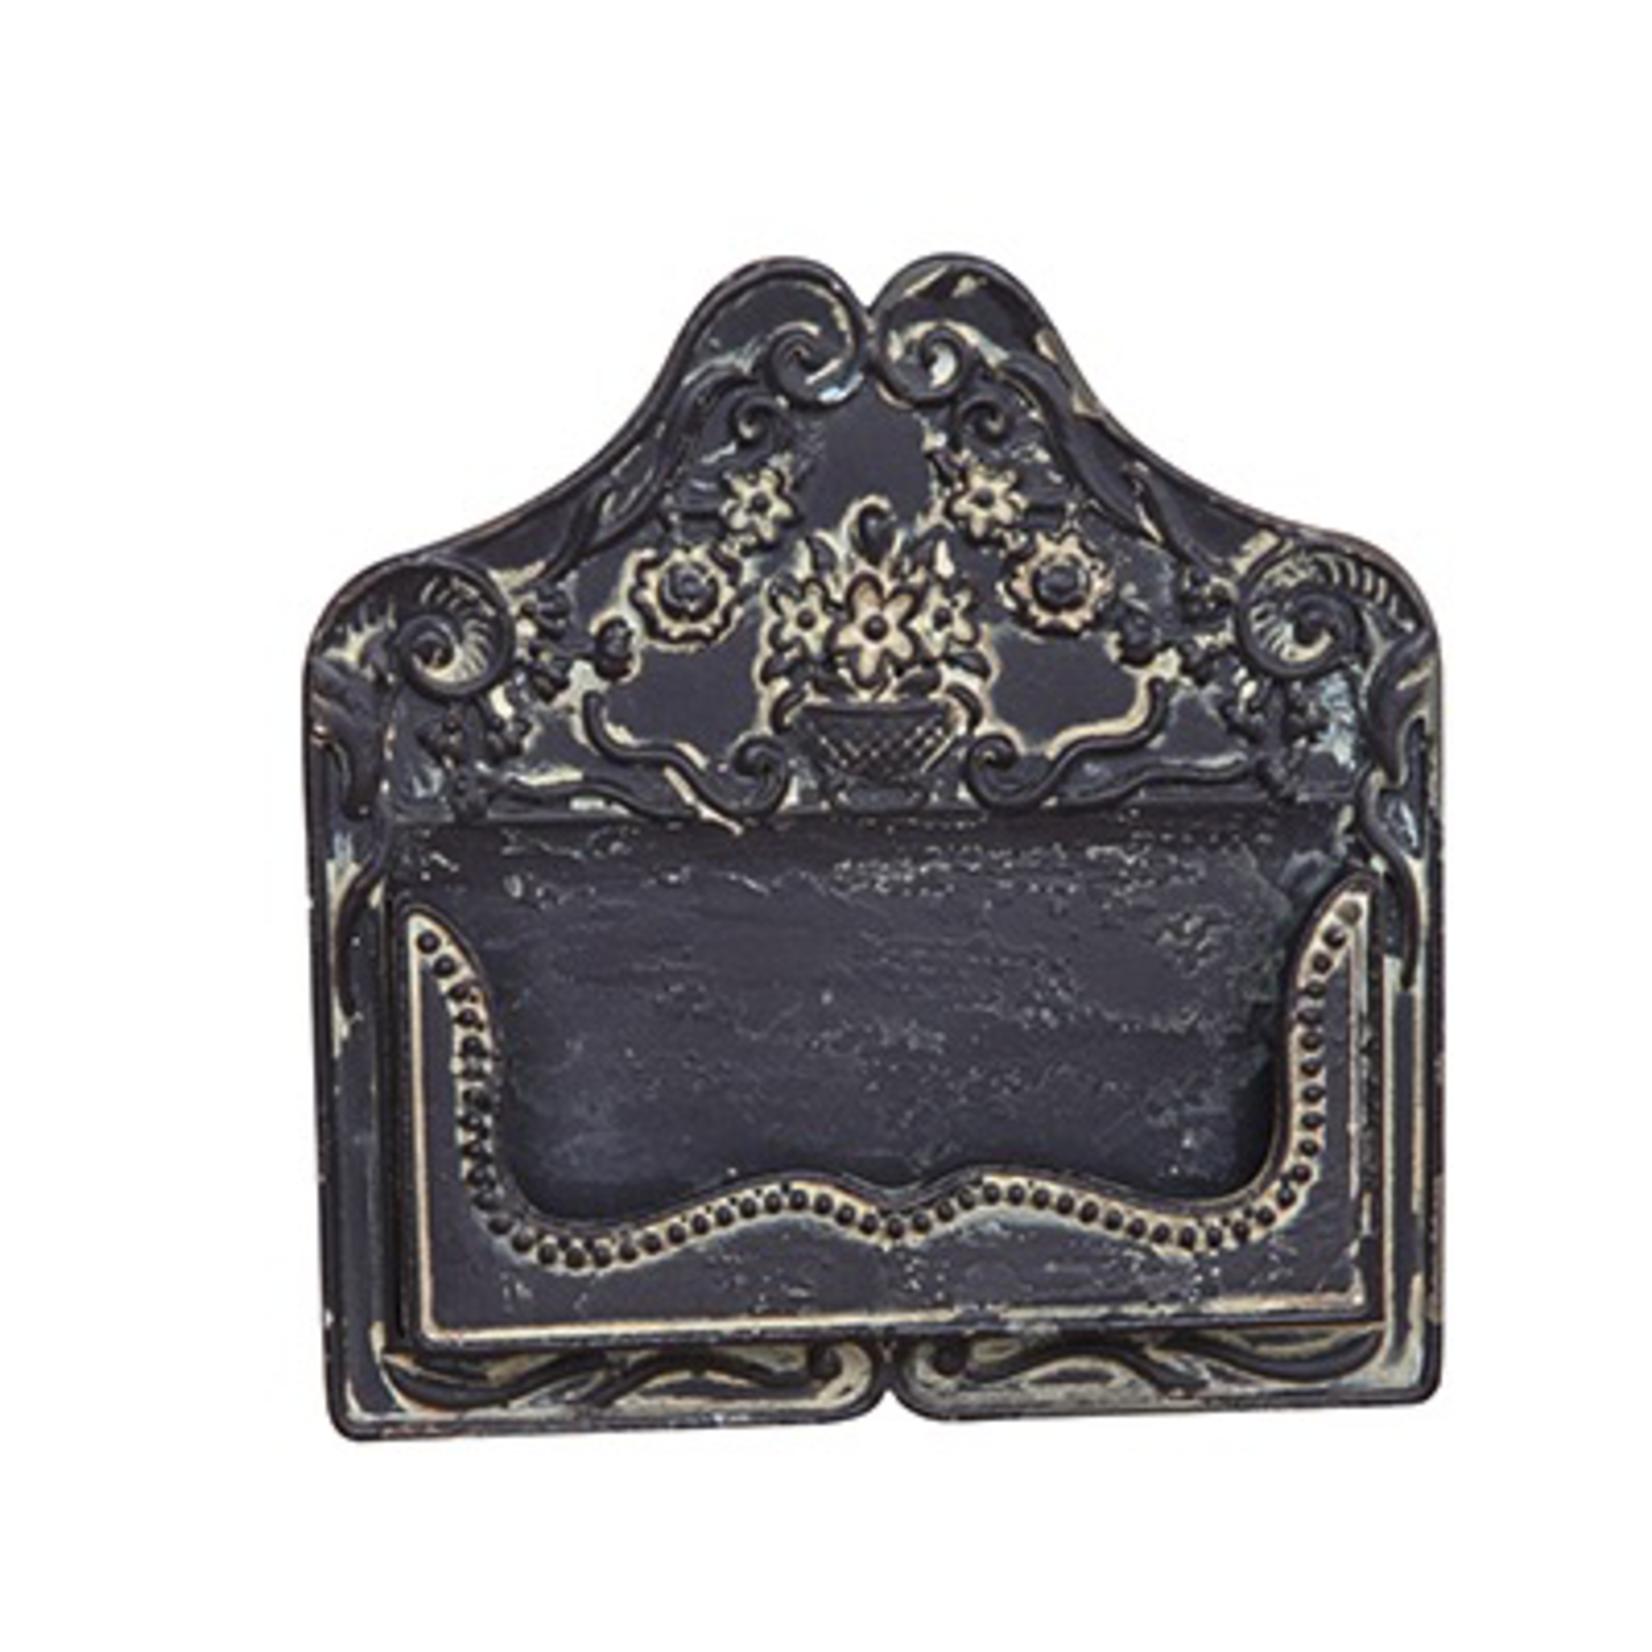 CHEHOMA CARD HOLDER ANTIQUE BLACK FINISH